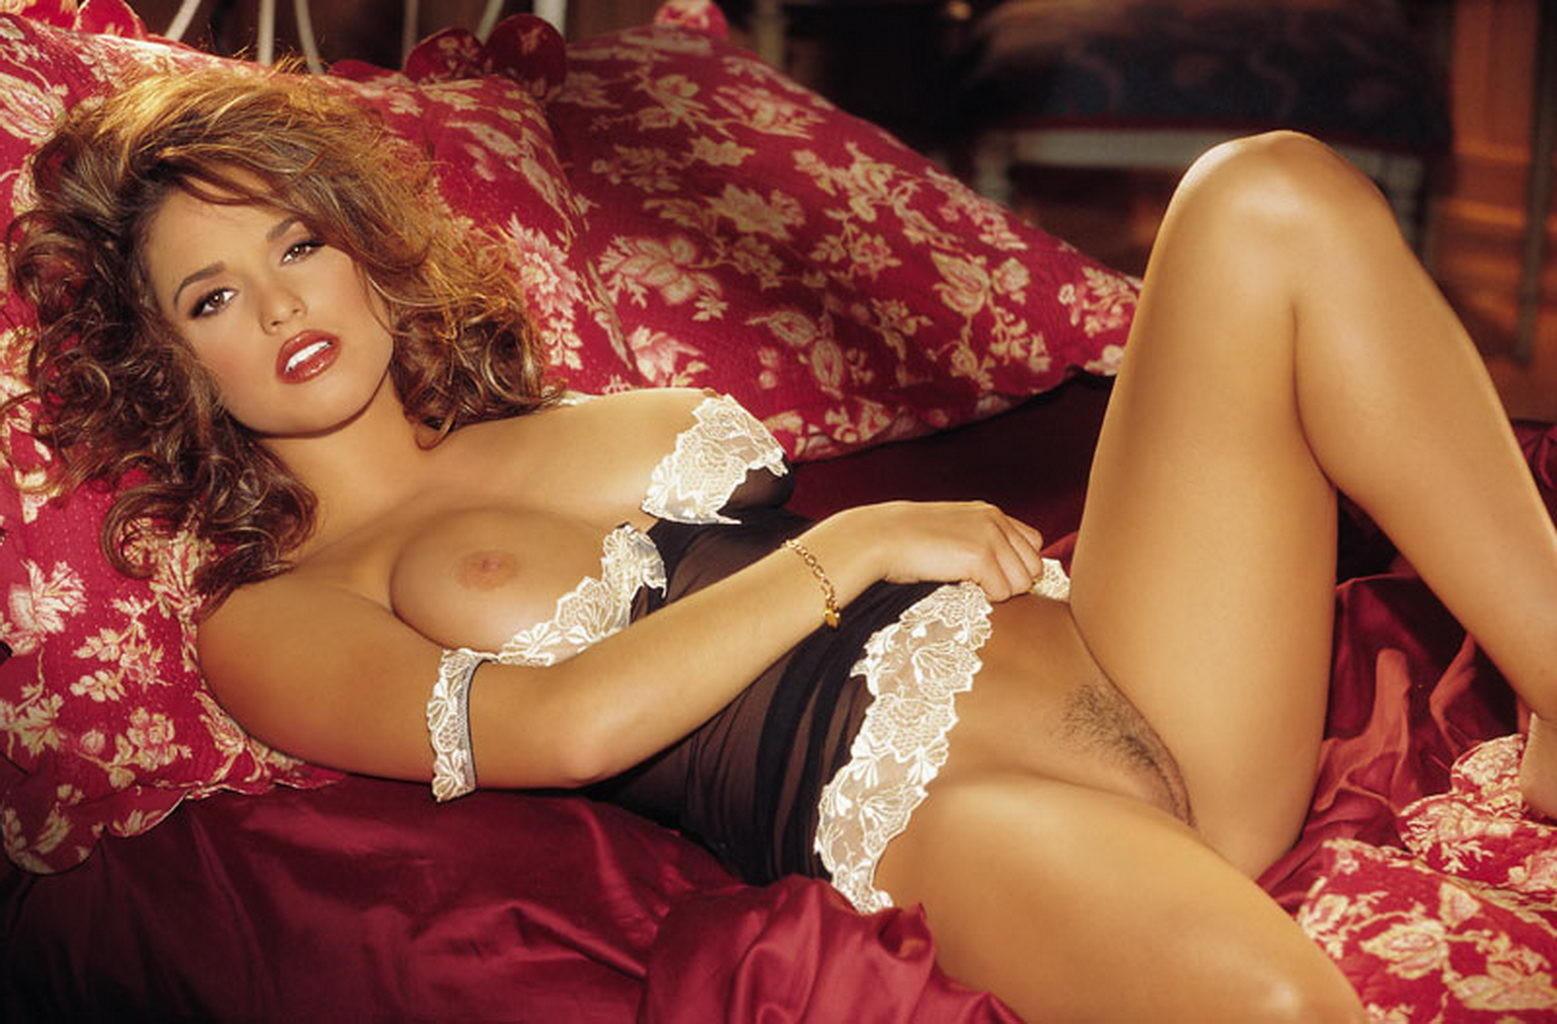 XXX Sex Images lindsey vuolo nude photos